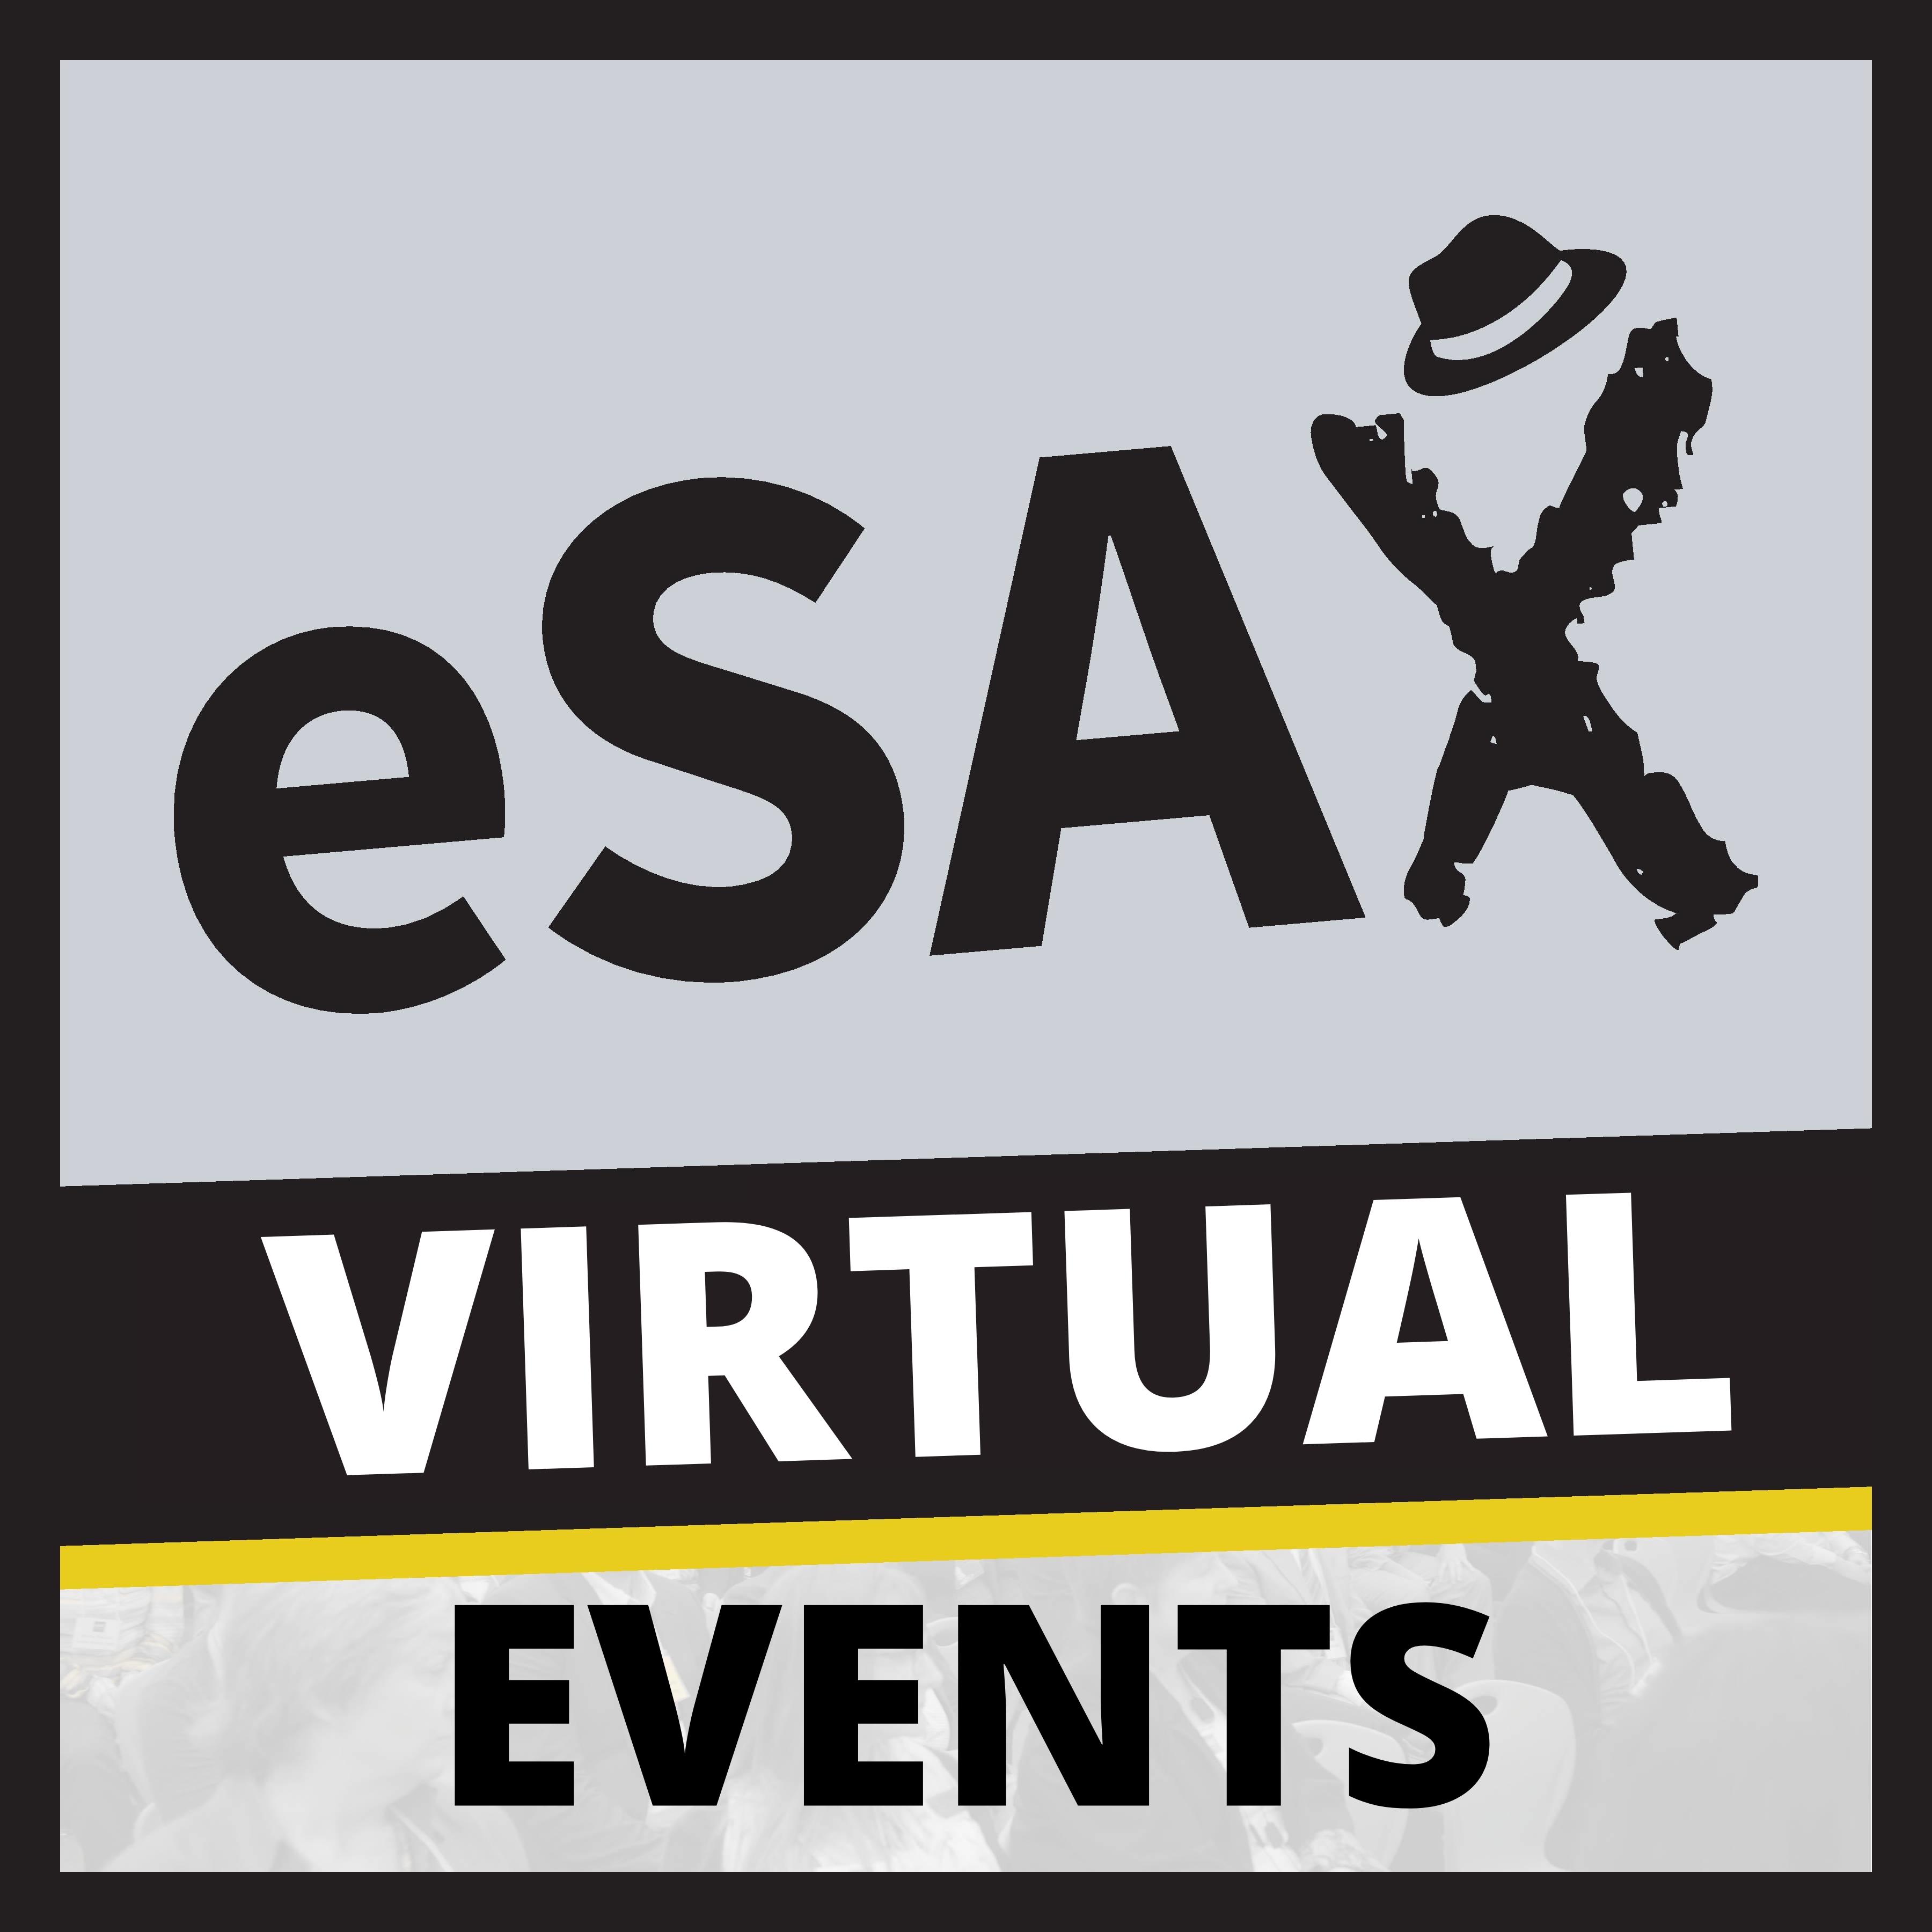 eSAX Virtual Events